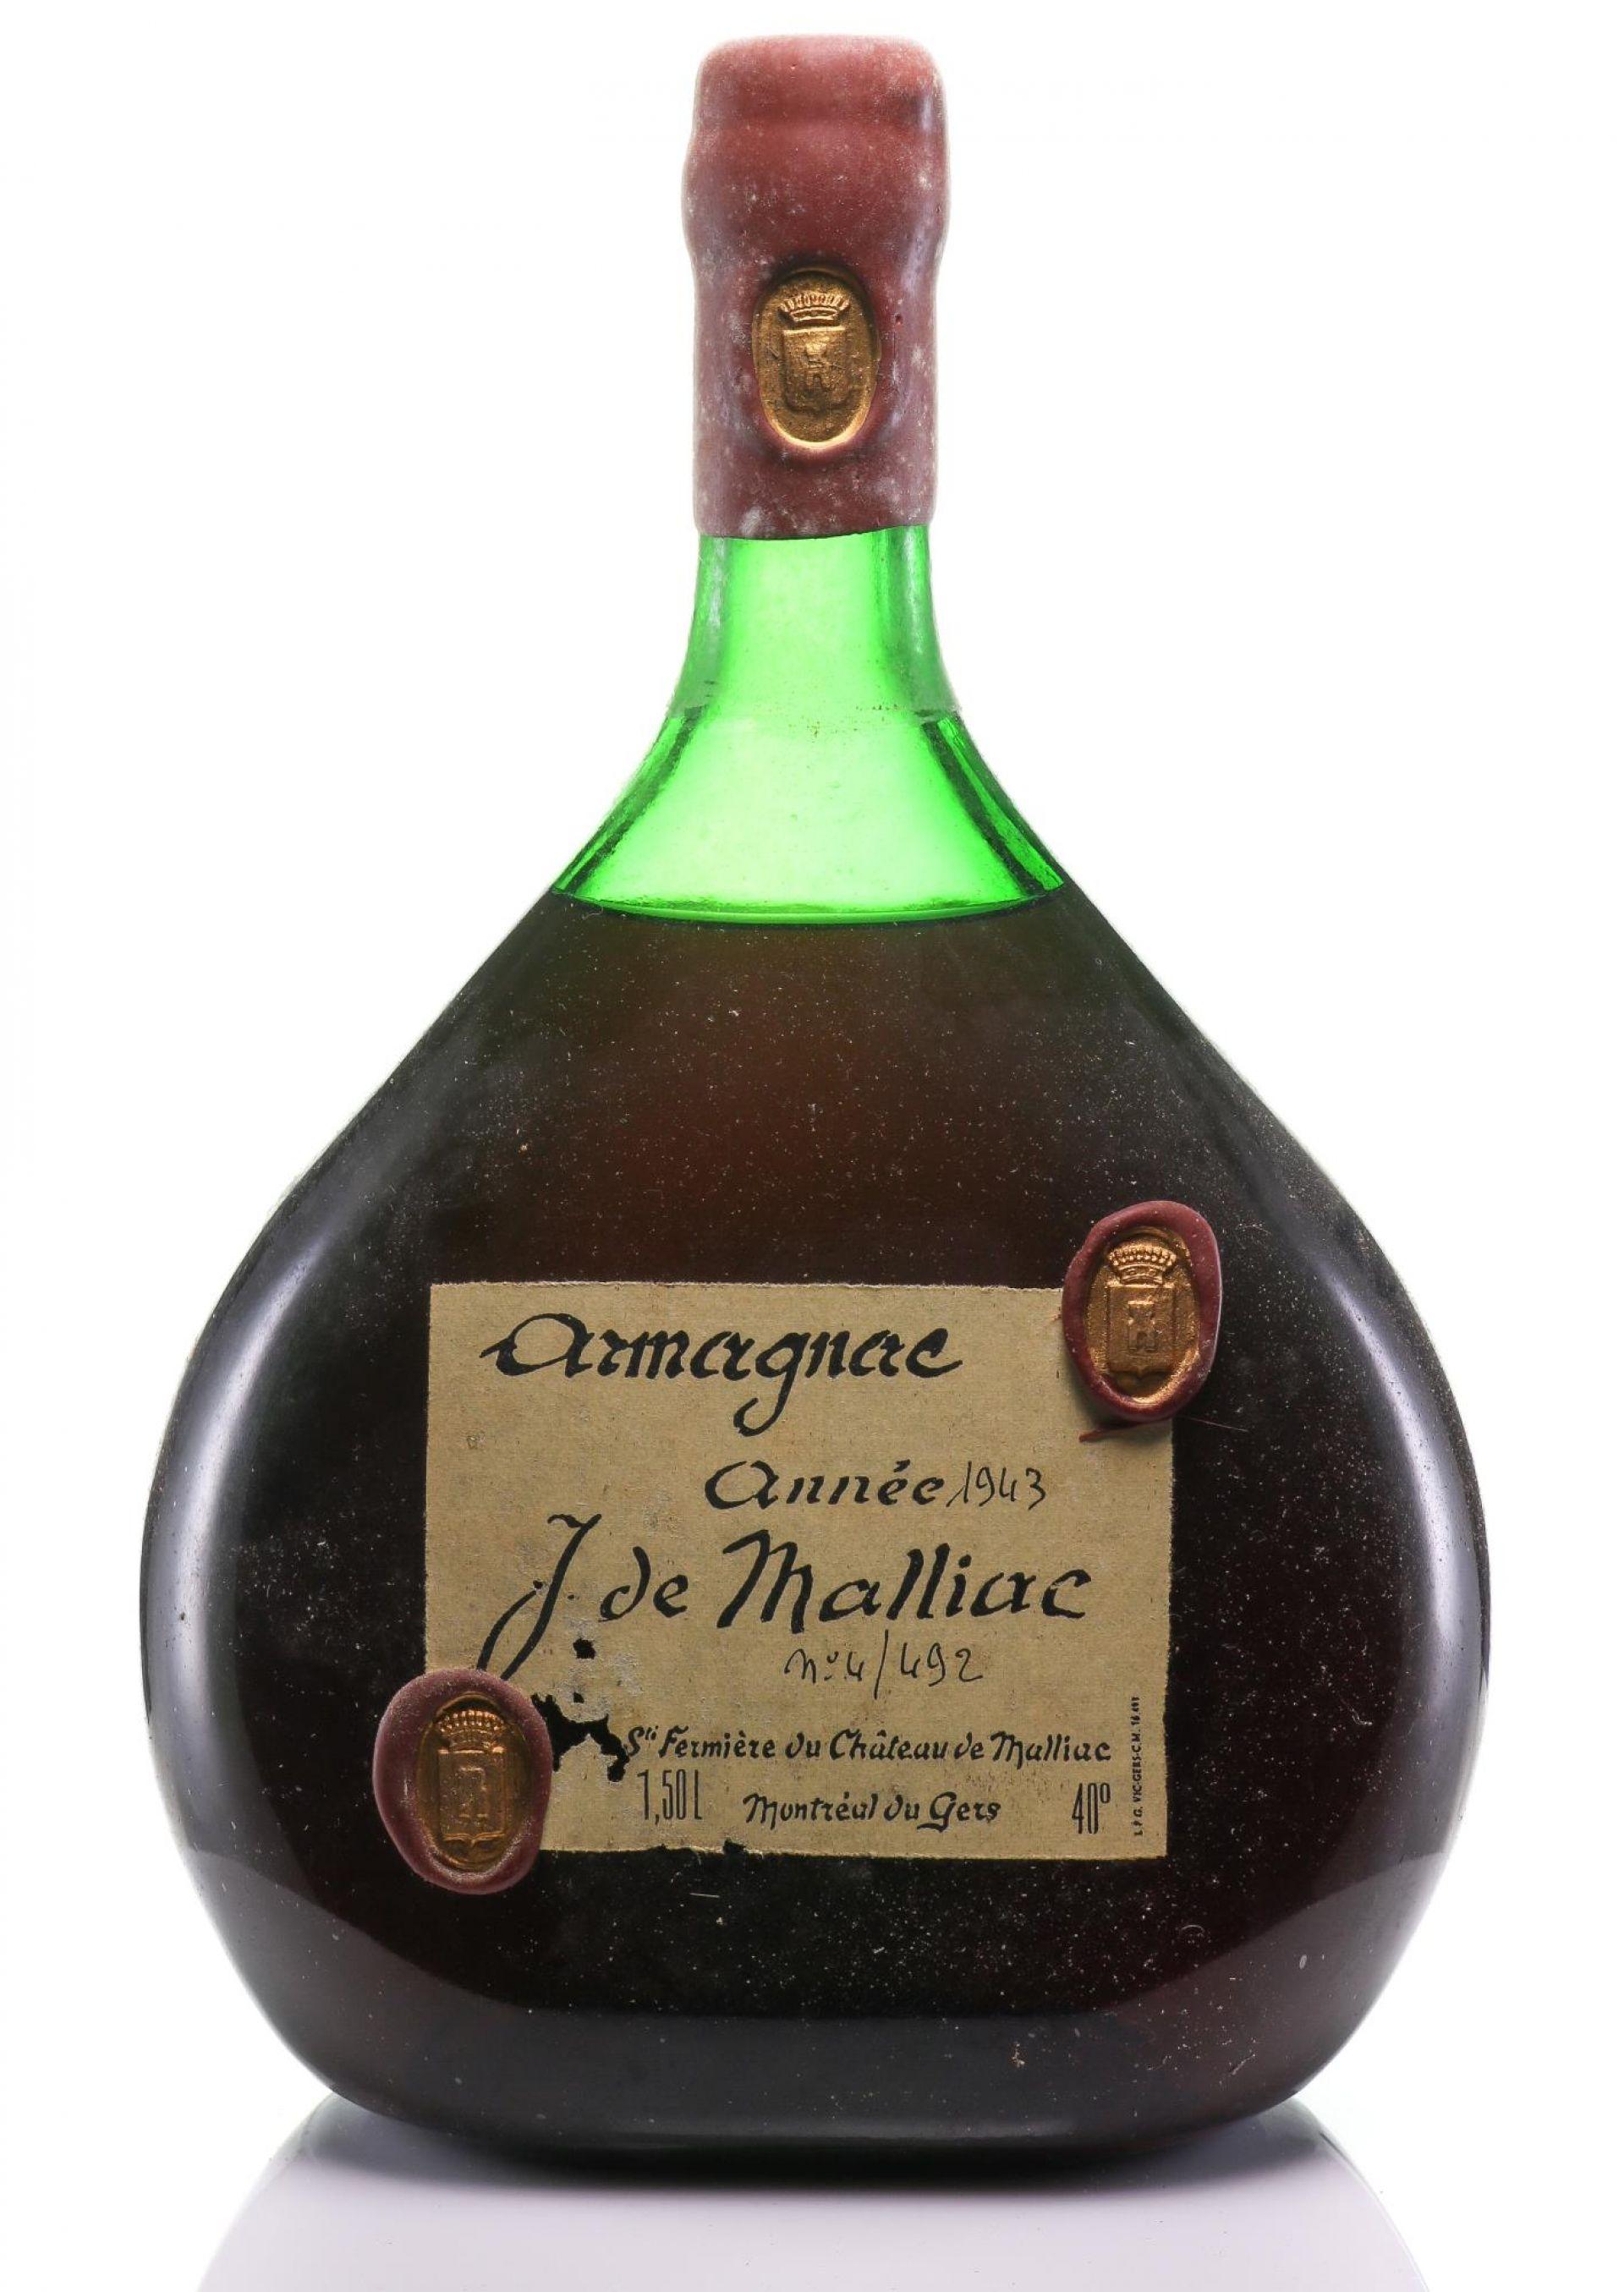 Armagnac 1943 Malliac, De